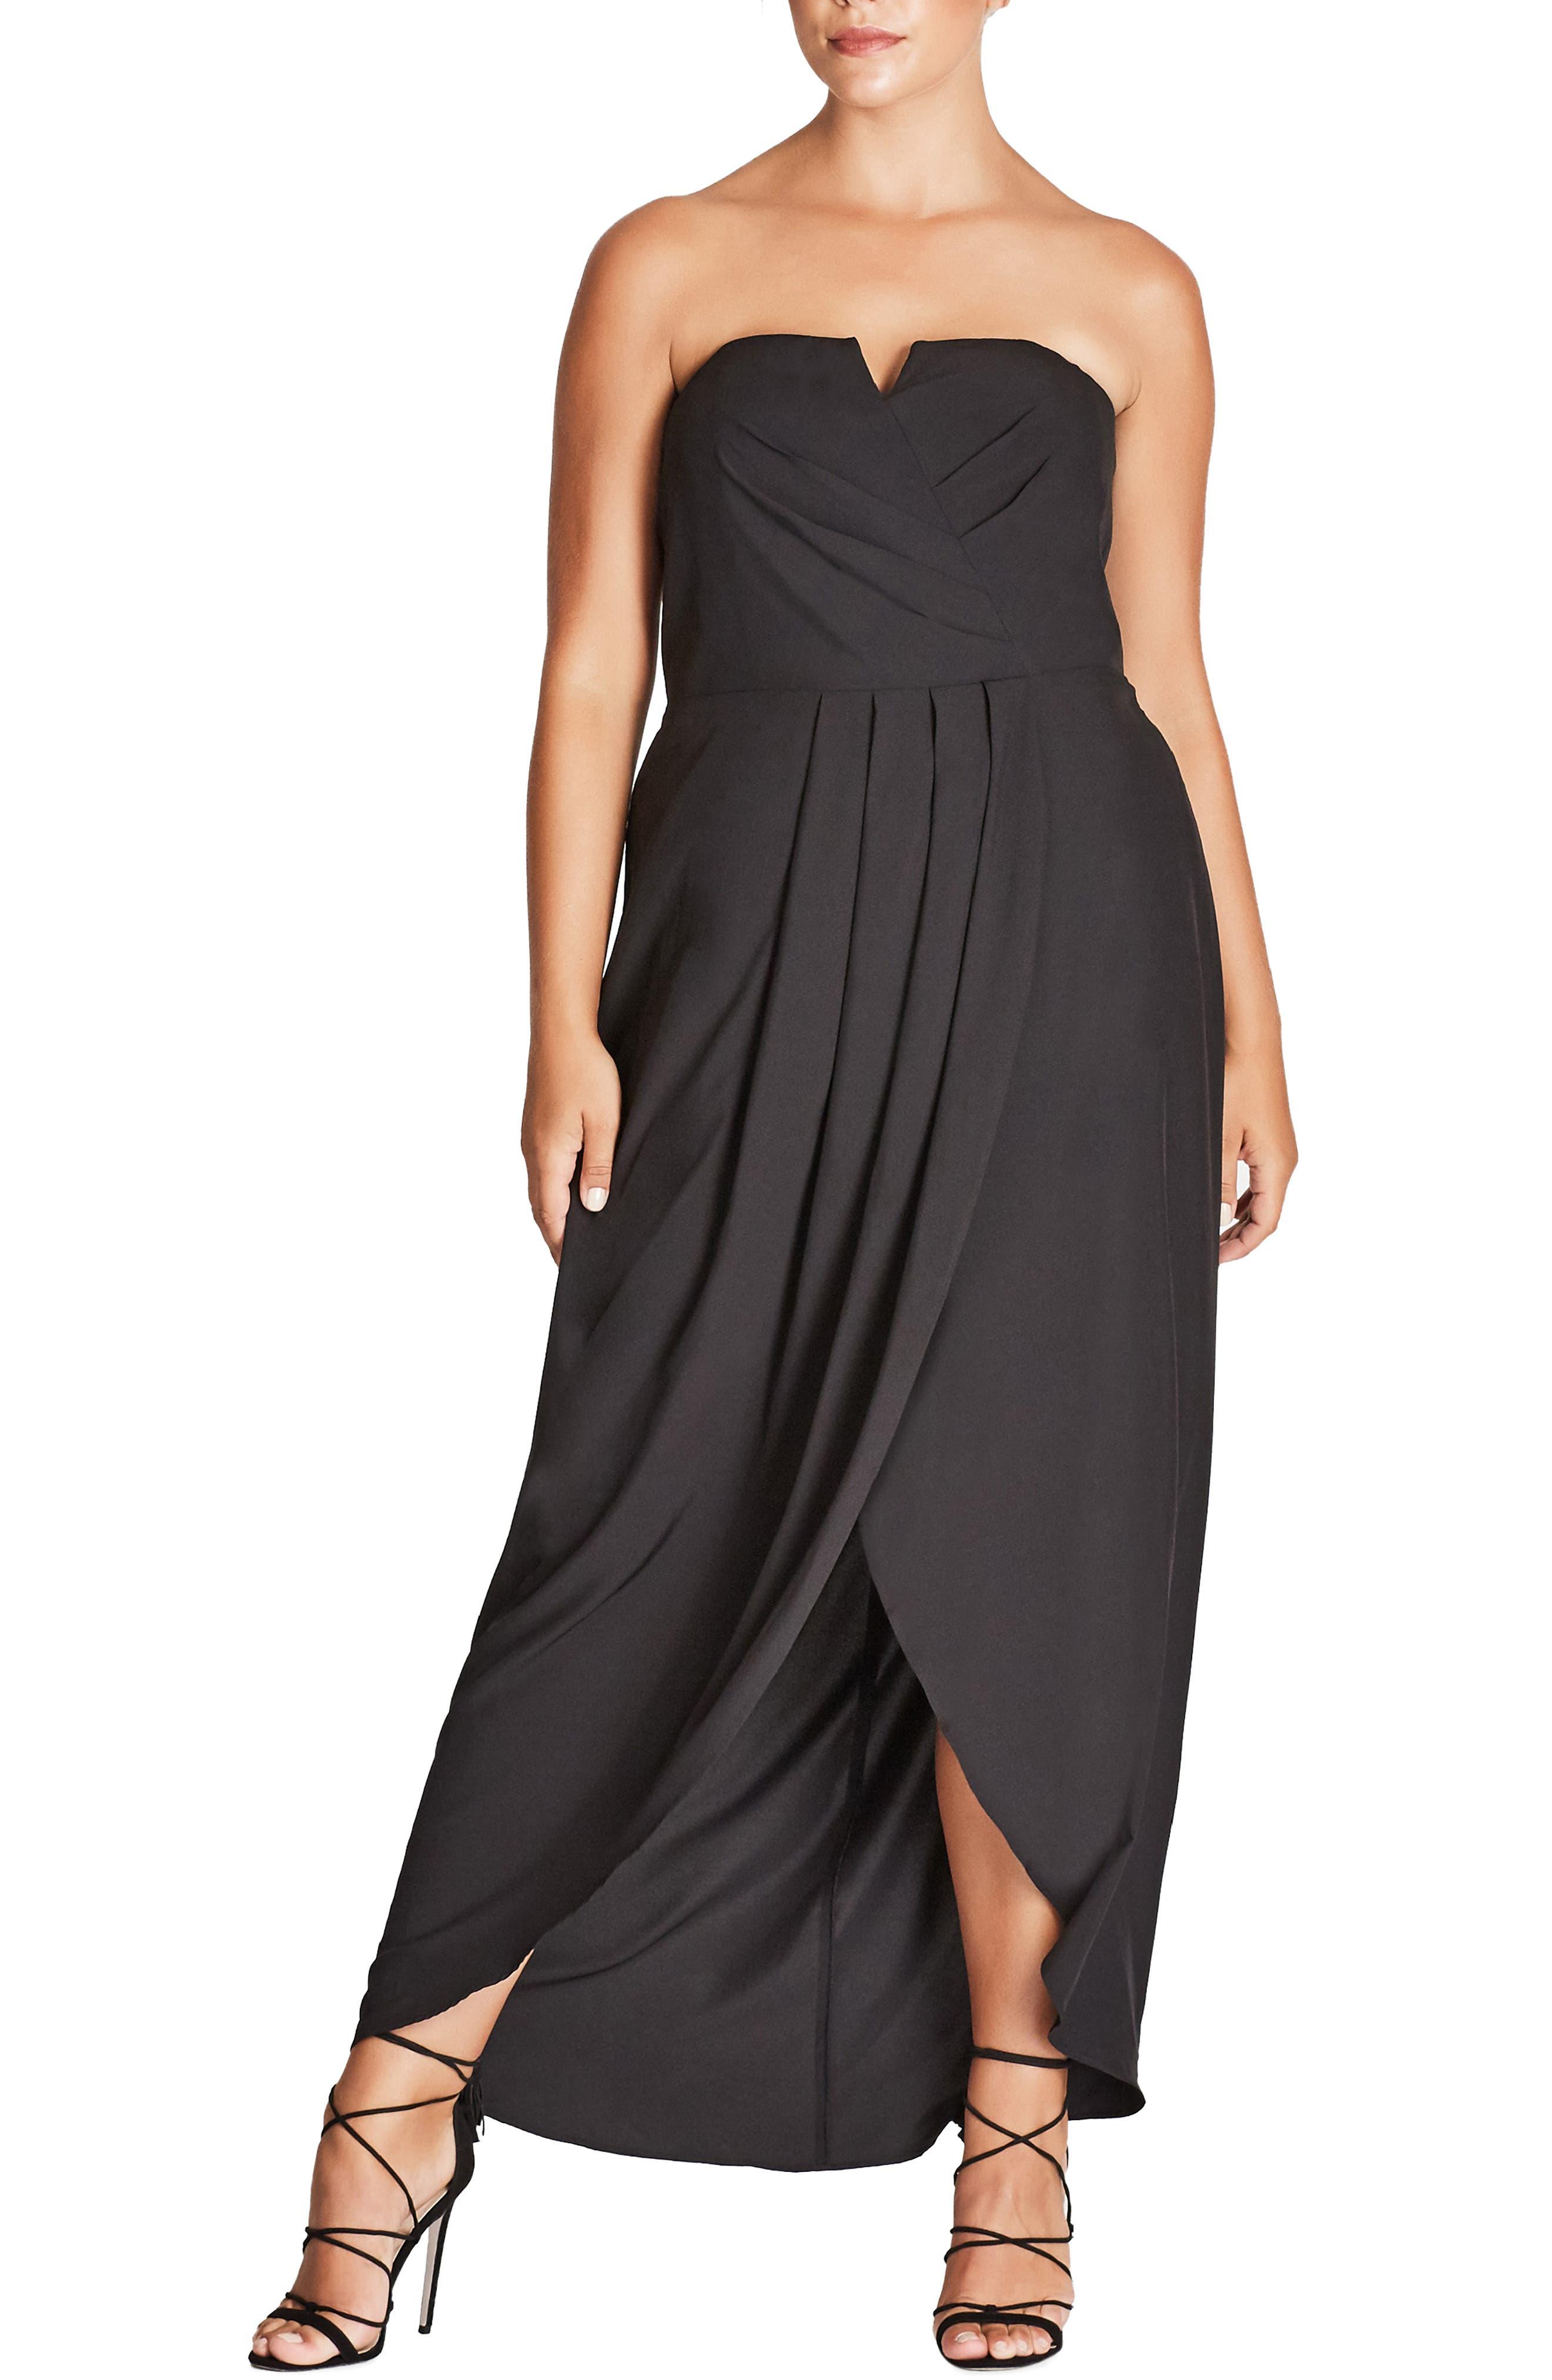 Plus Size City Chic Romantic Drape Maxi Dress, Black